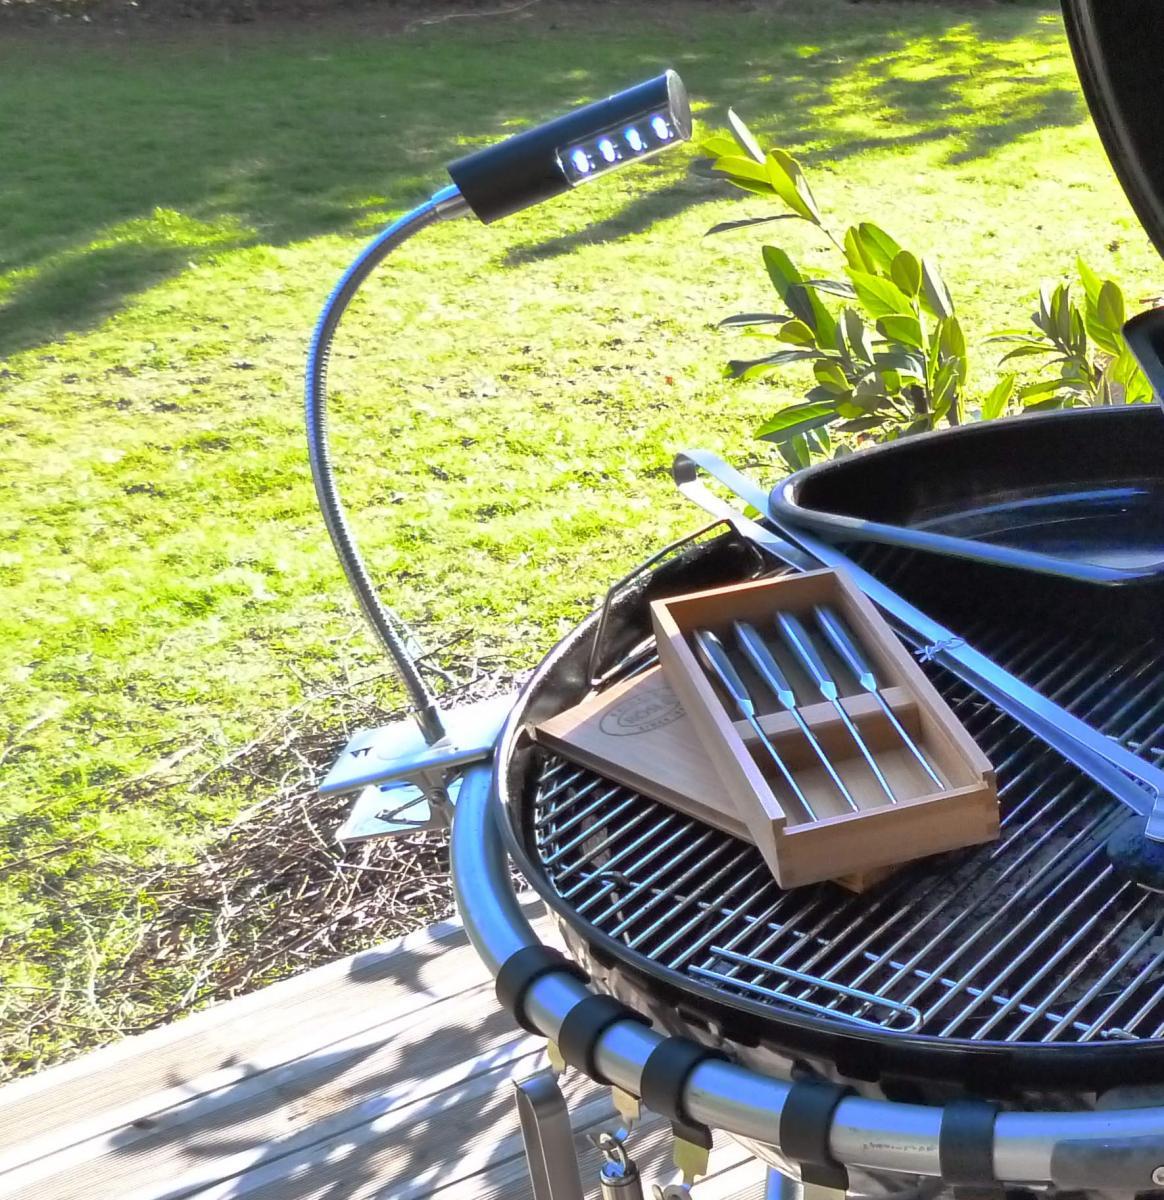 roesle steakmesser grillforum und bbq. Black Bedroom Furniture Sets. Home Design Ideas